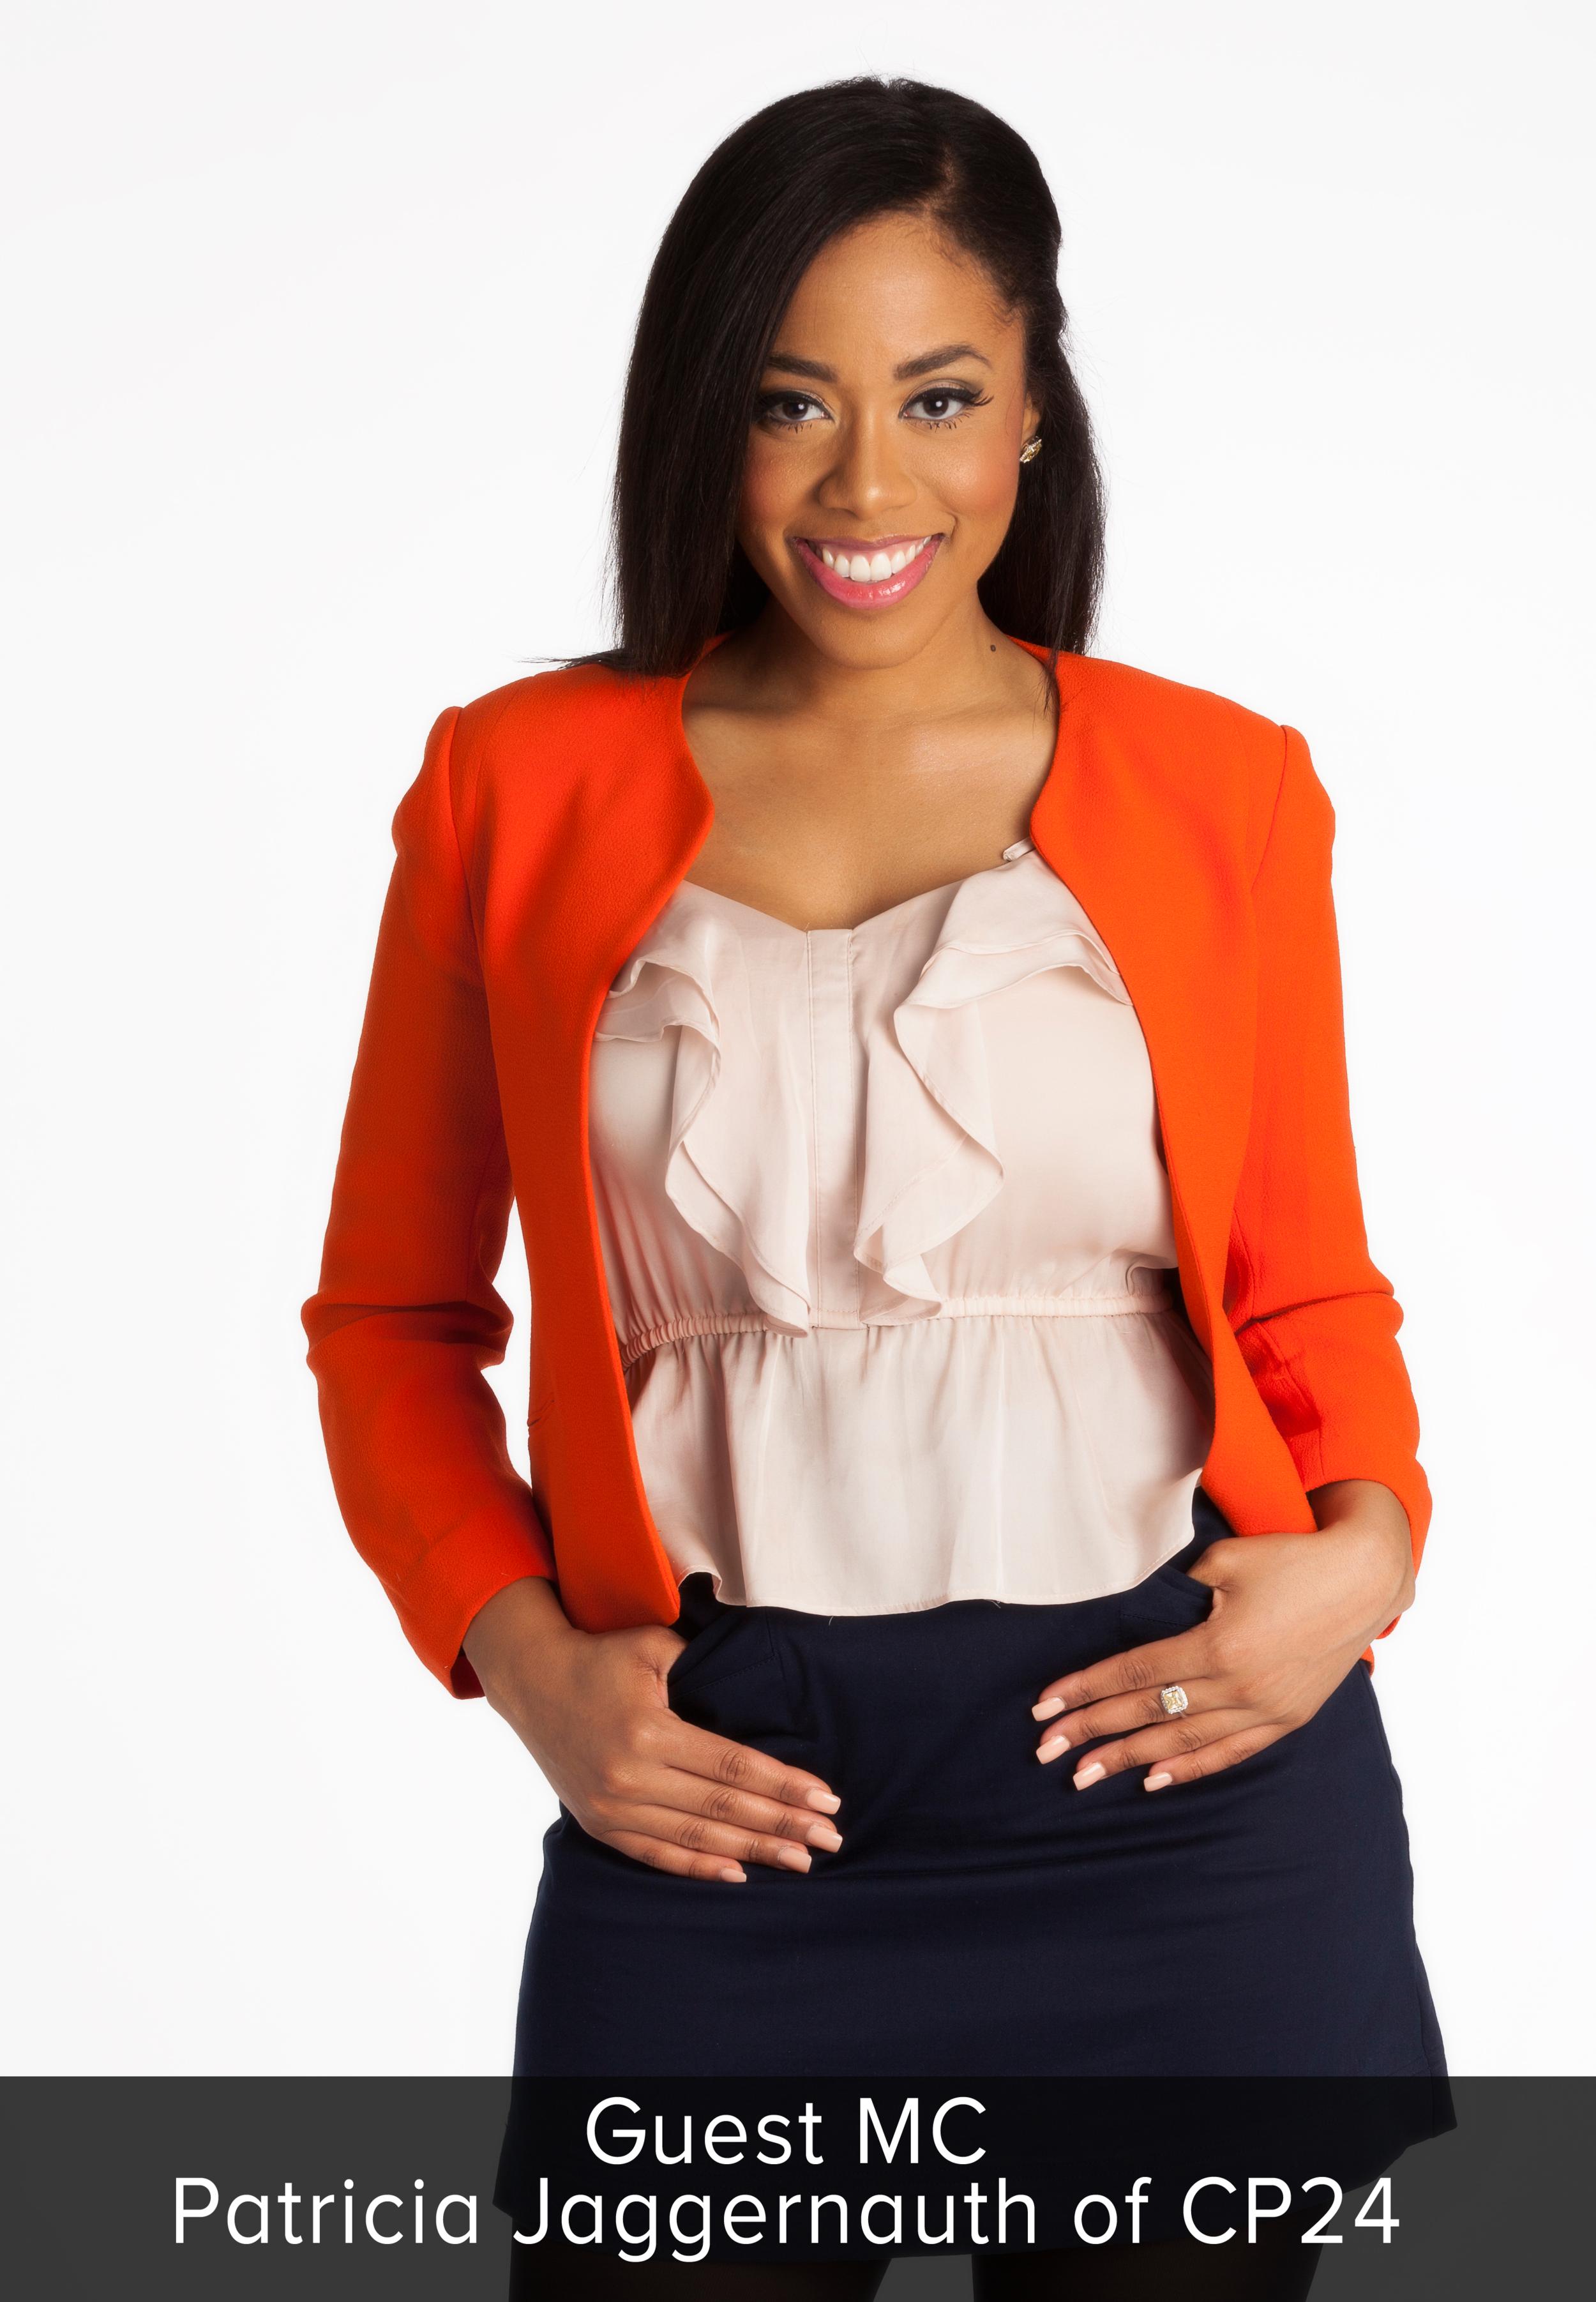 Patricia Jaggernauth - TV HostWeb Personality copy.png